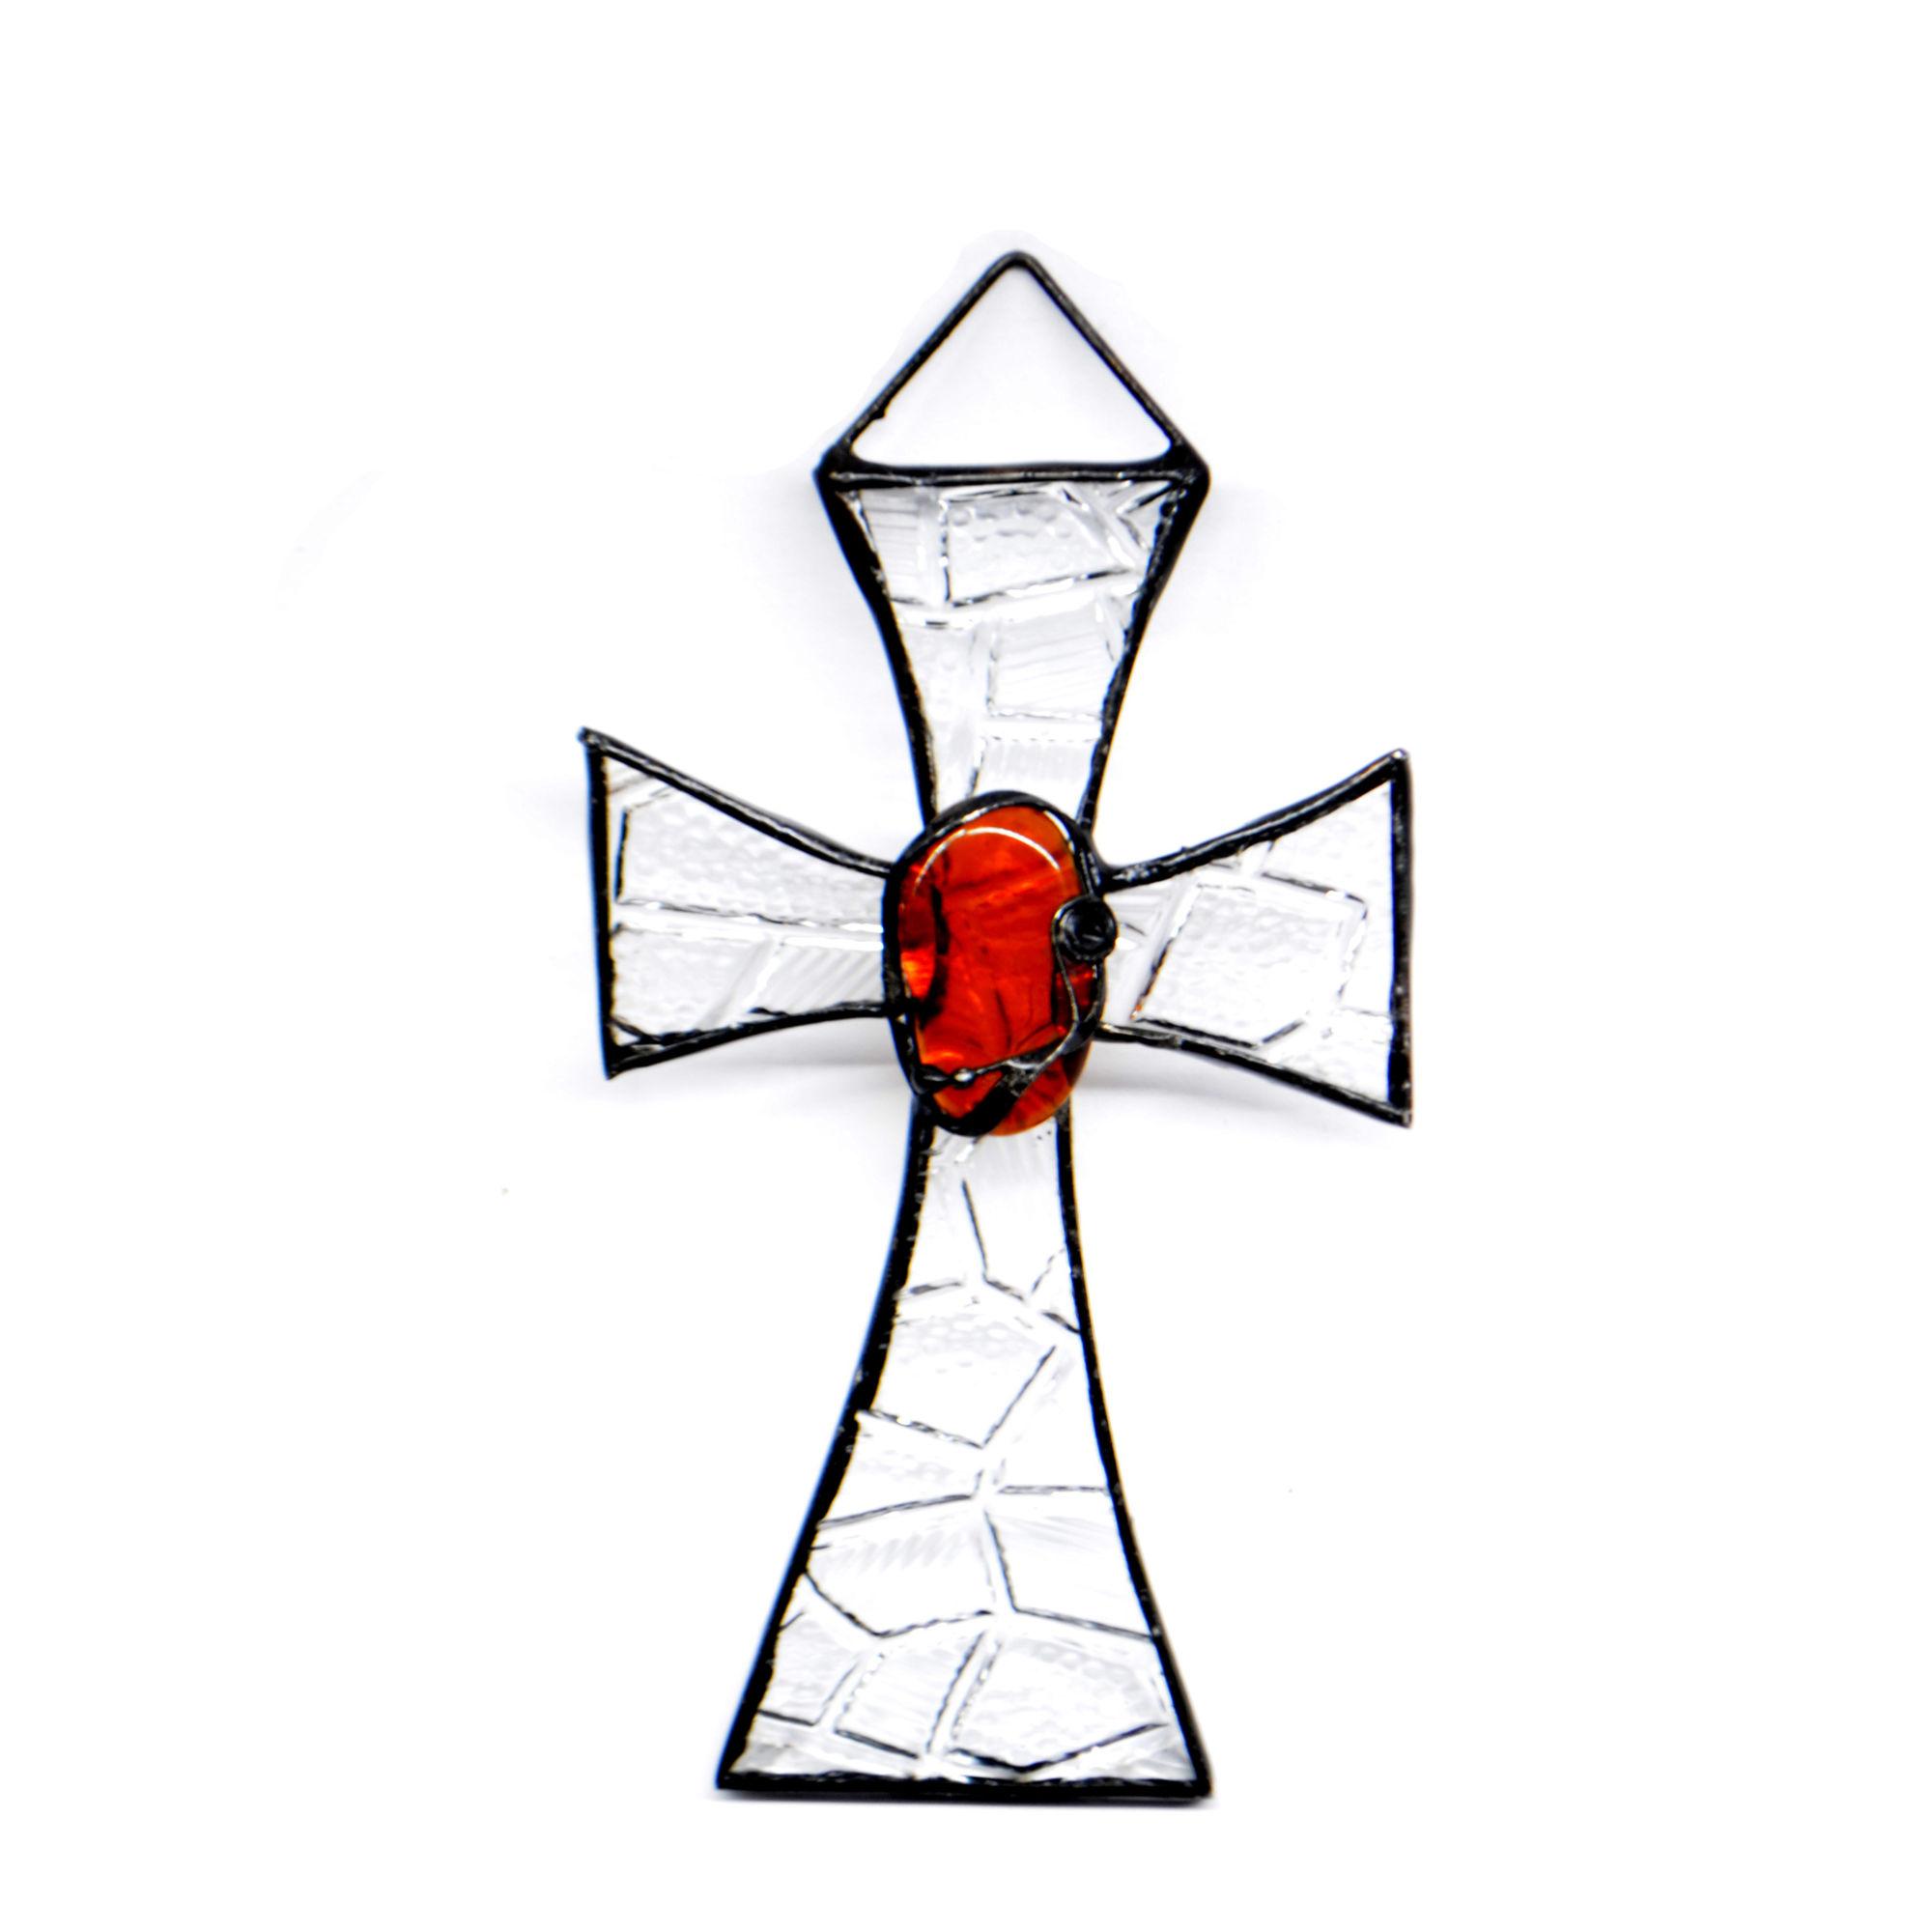 Barevný křížek